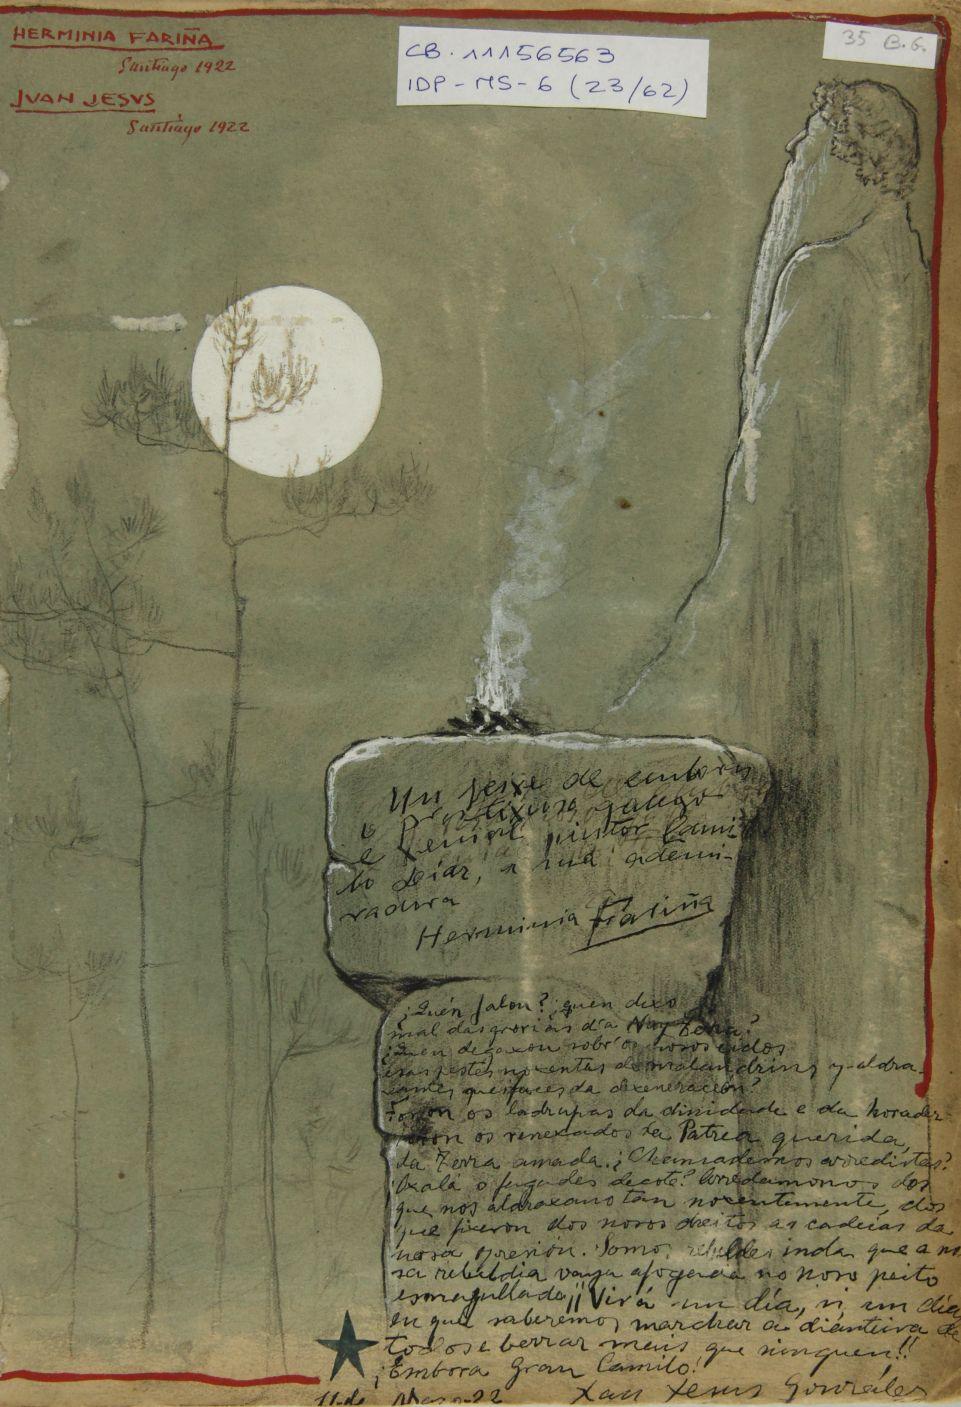 Dibujo de un anciano con barba larga observando la luna